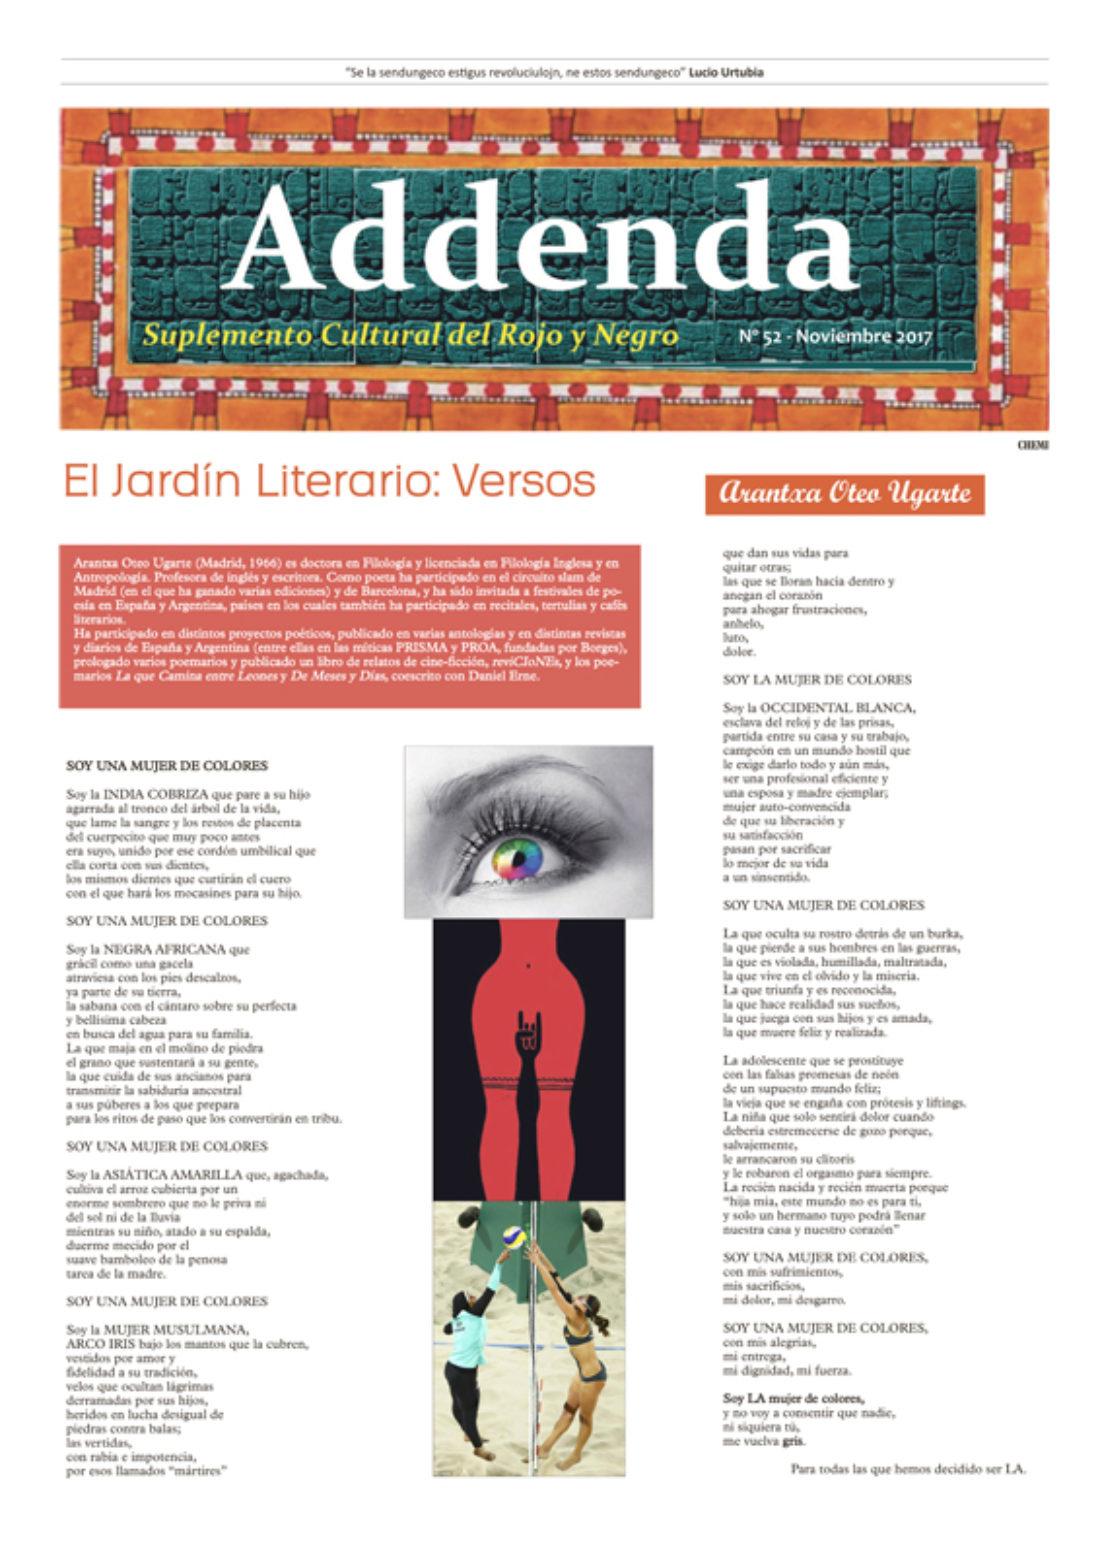 Addenda, suplemento cultural del RyN – Nº 52, noviembre 2017